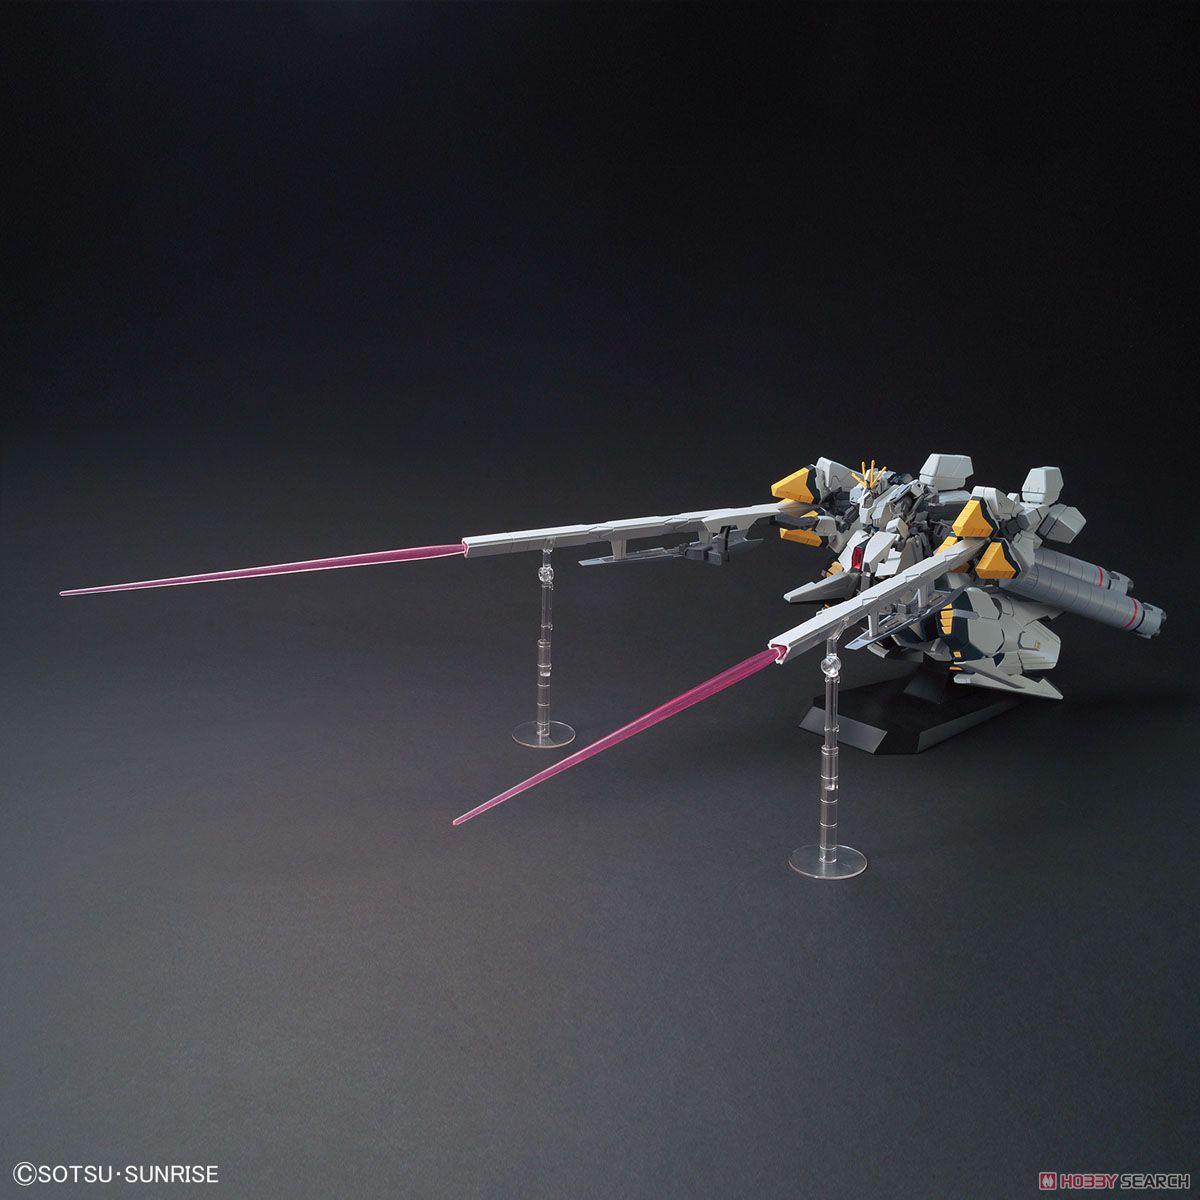 HGUC『ナラティブガンダム A装備』ガンダムNT 1/144 プラモデル-005